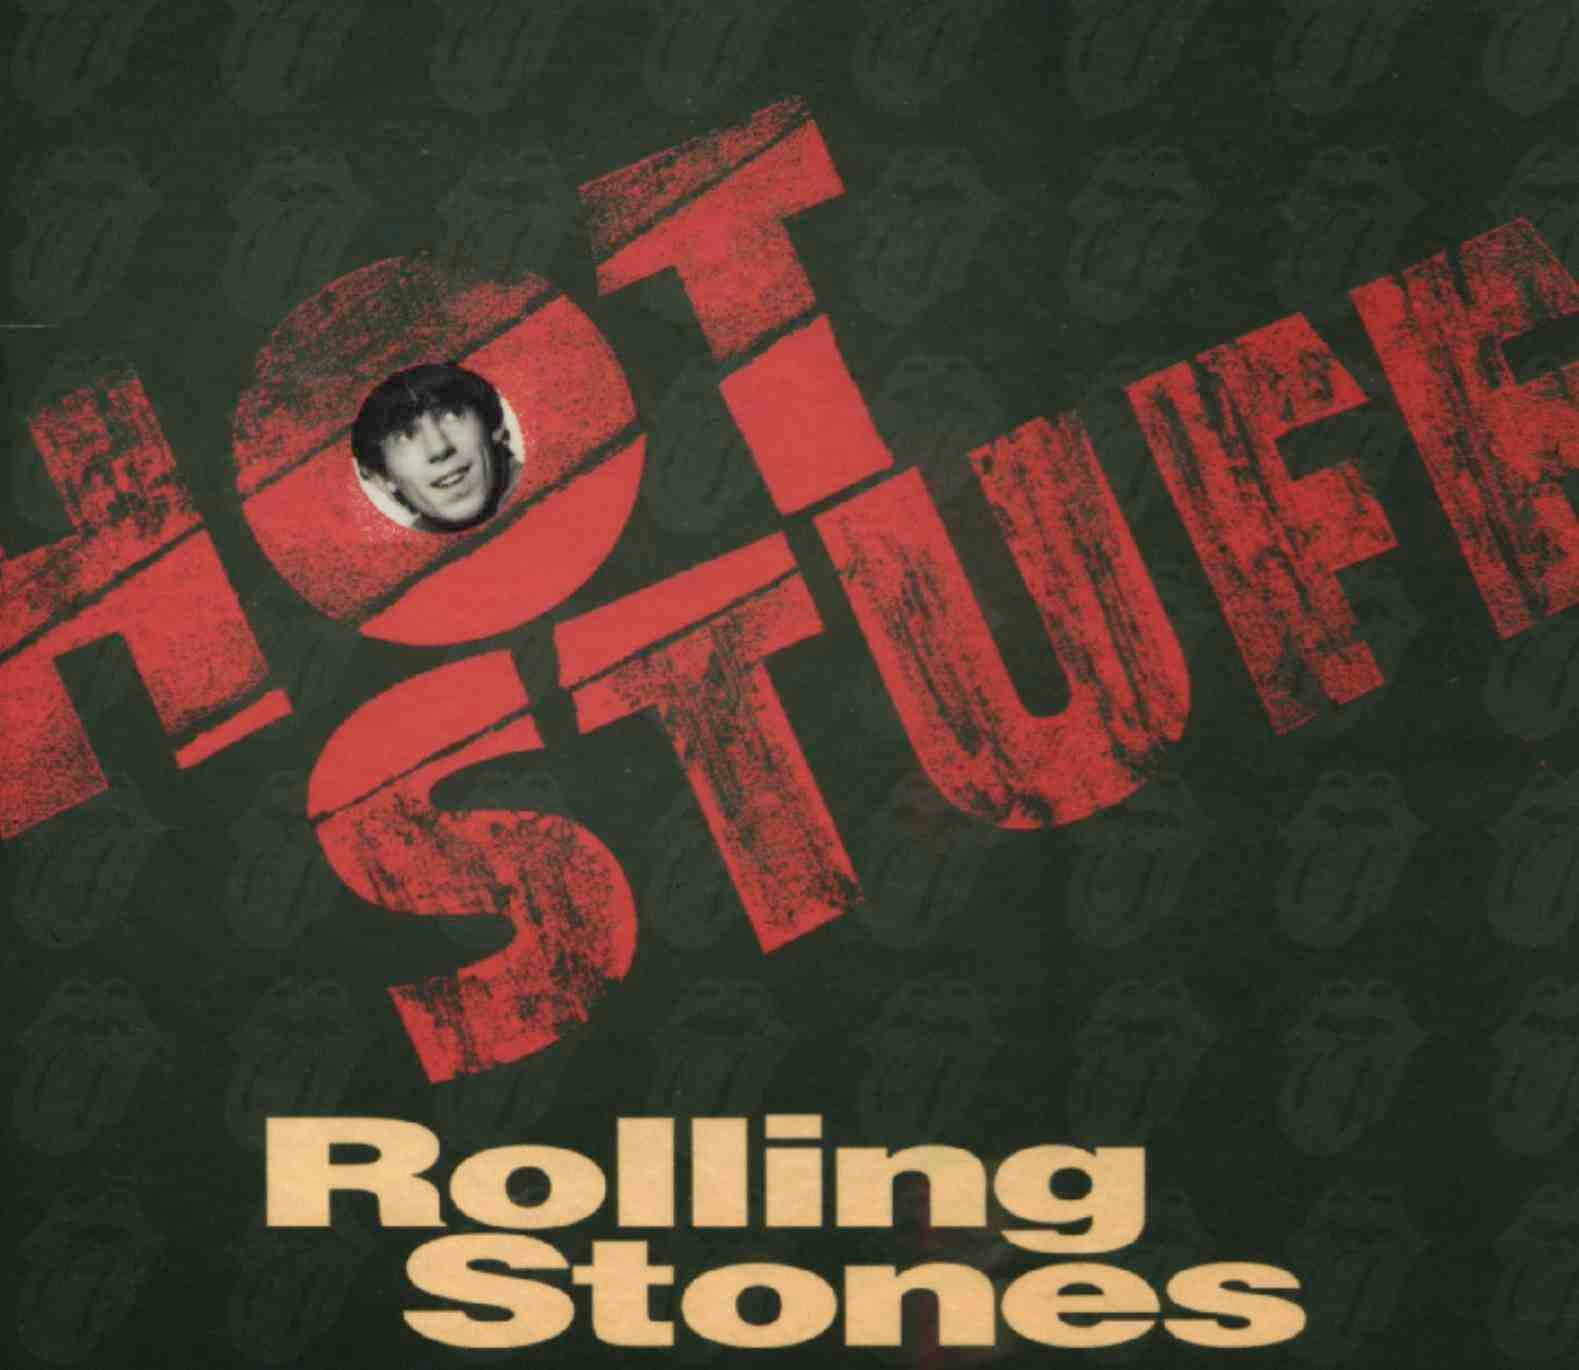 Plumdusty s page pink floyd 1975 06 12 spectrum theater philadelphia - Rolling Stones Hot Stuff Vol 1